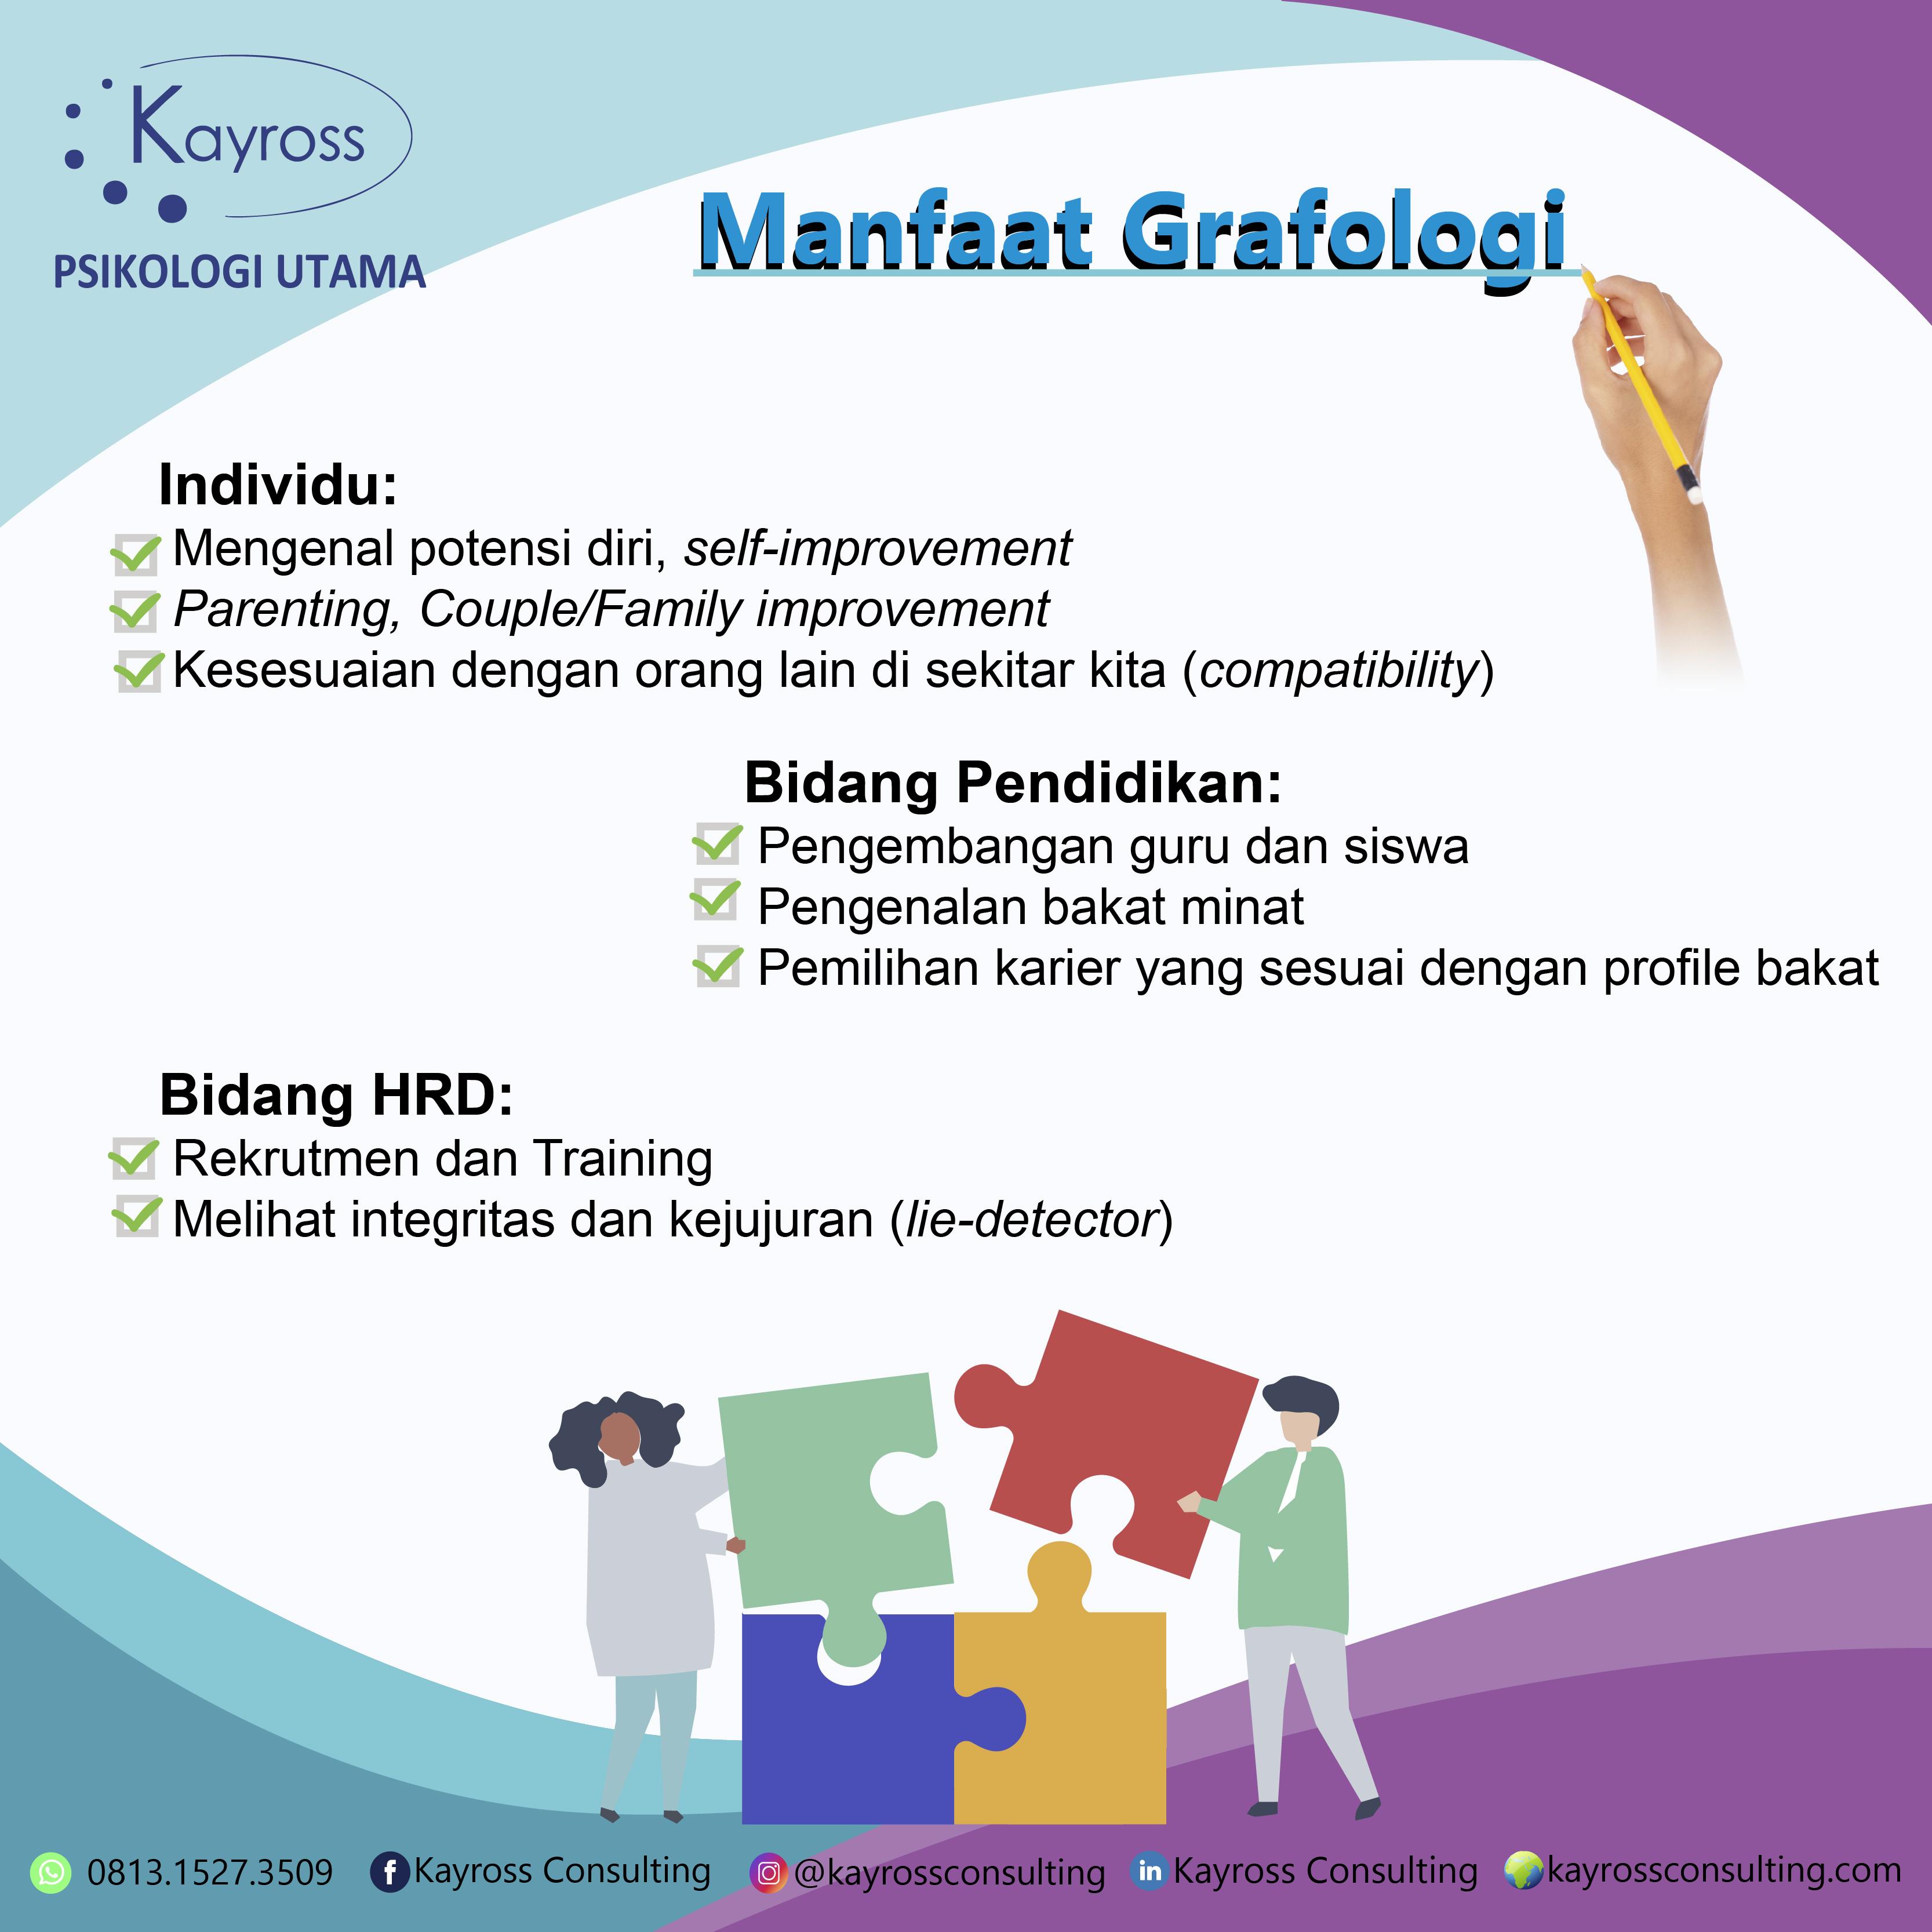 Manfaat Grafologi-01